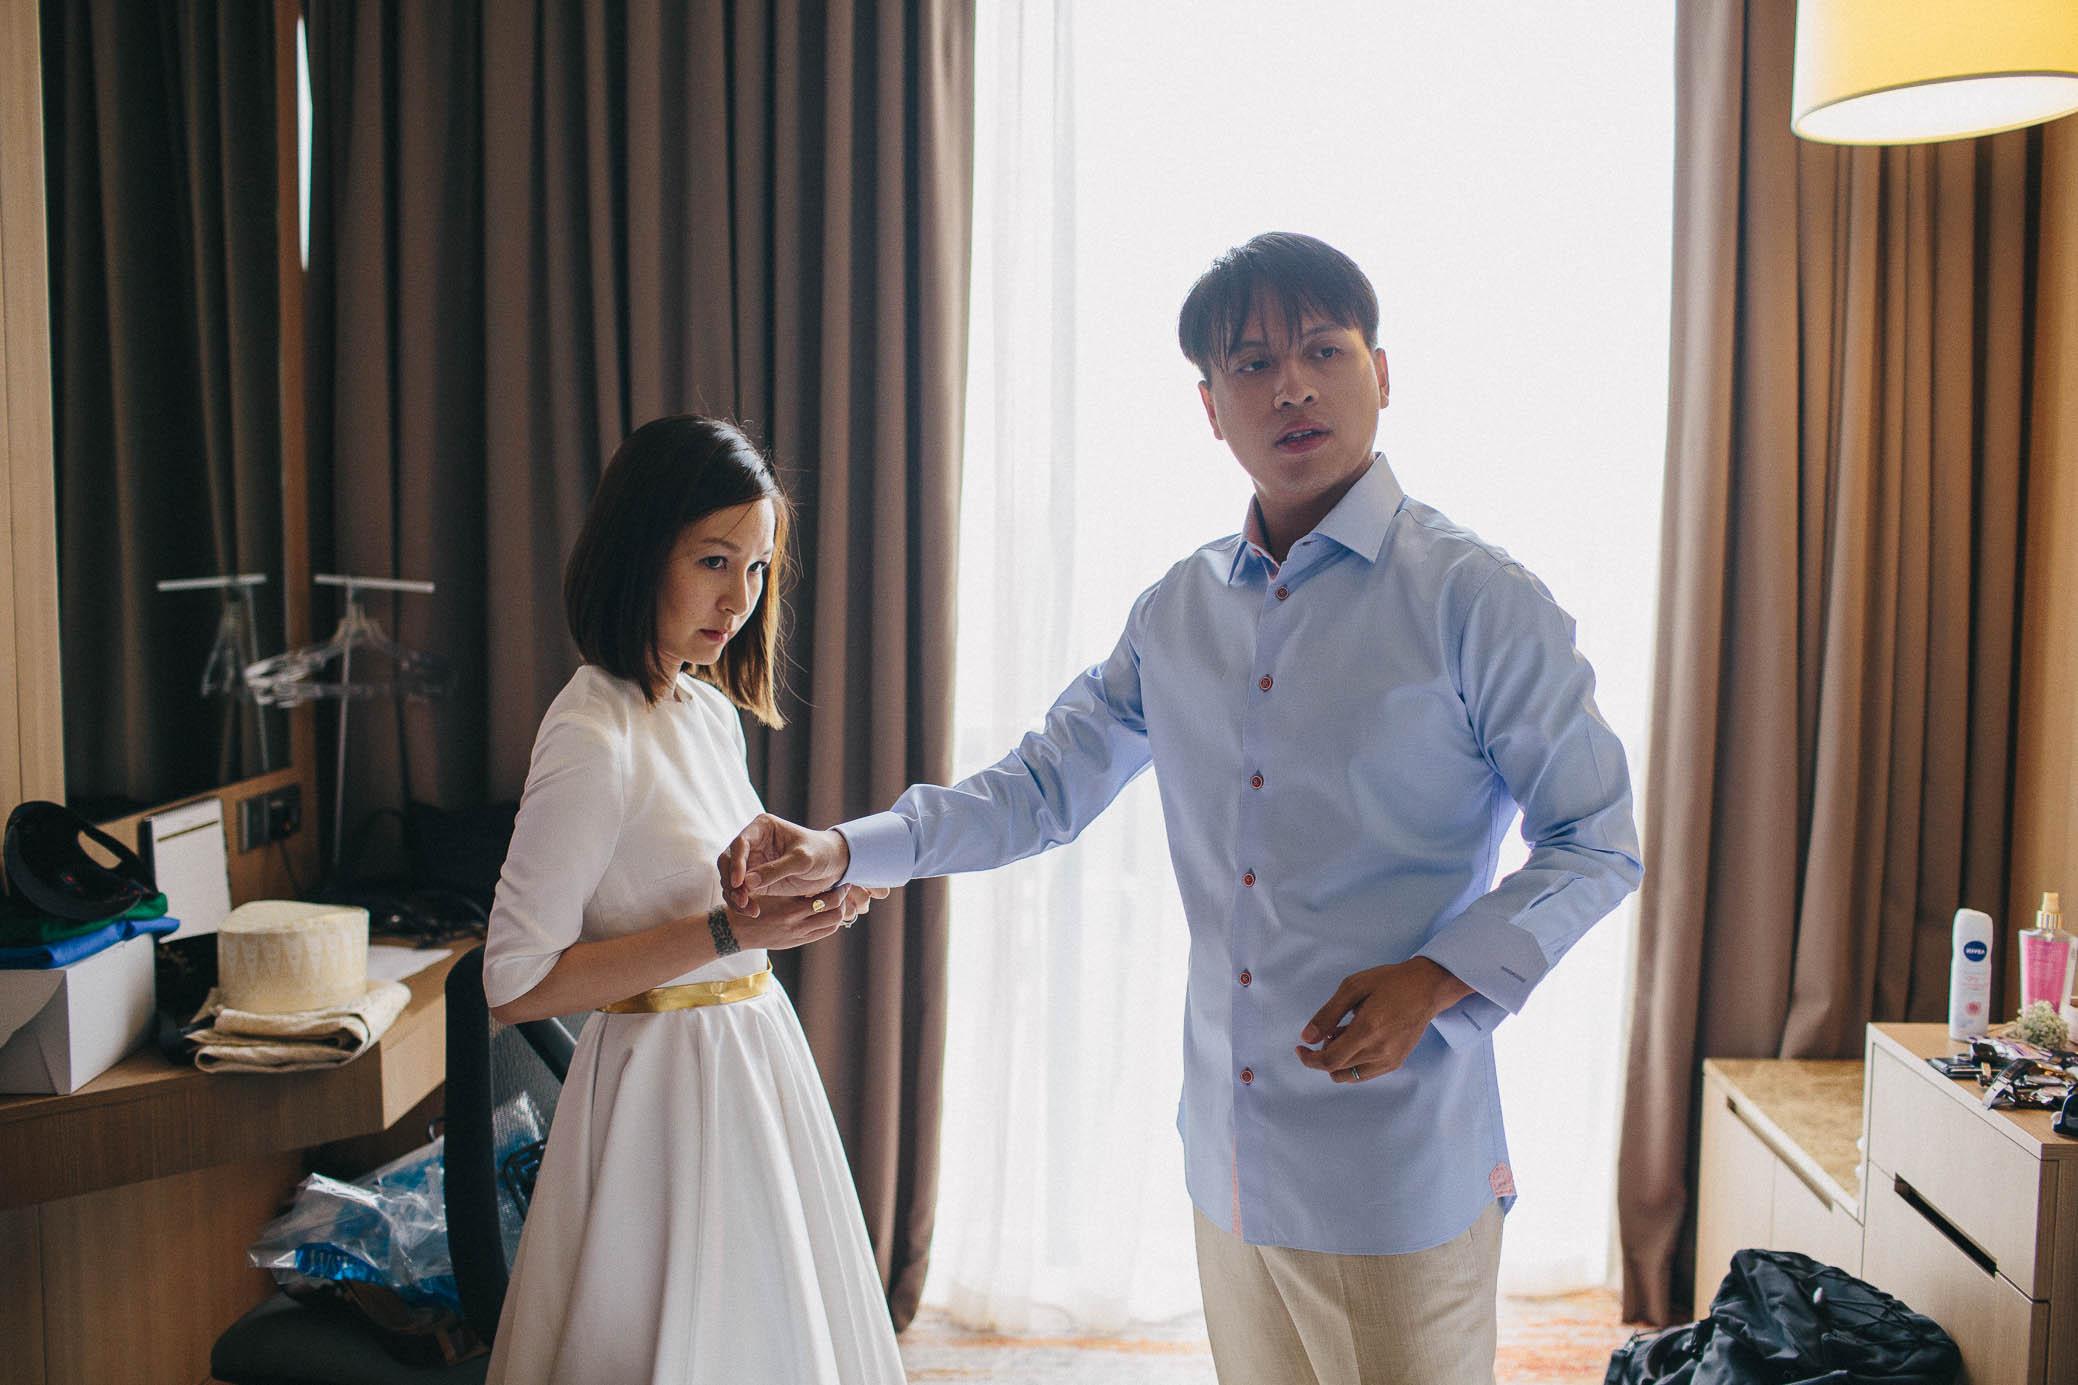 singapore-wedding-photographer-malay-indian-pre-wedding-travel-wmt-2015-alif-ethel-39.jpg